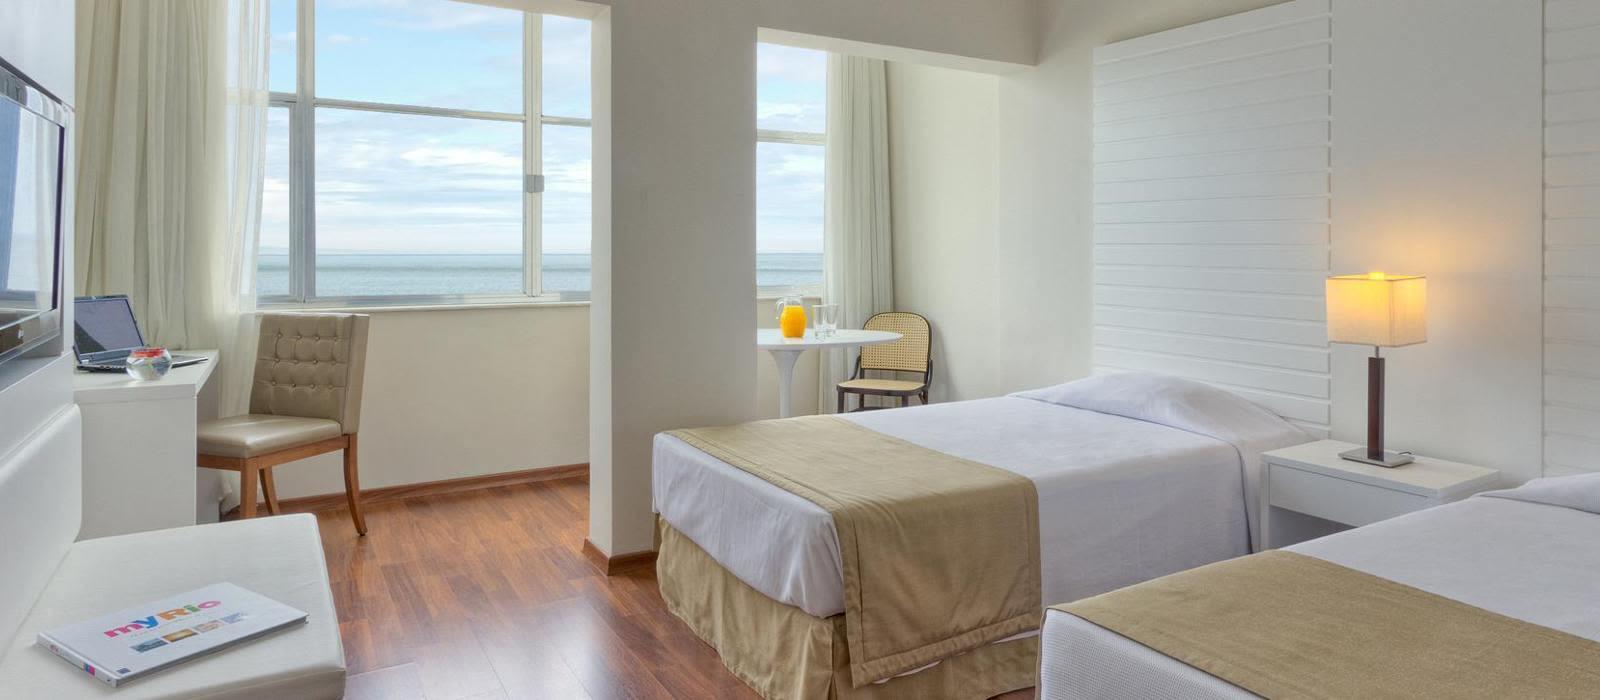 Hotel Mercure Rio de Janeiro Copacabana Brazil